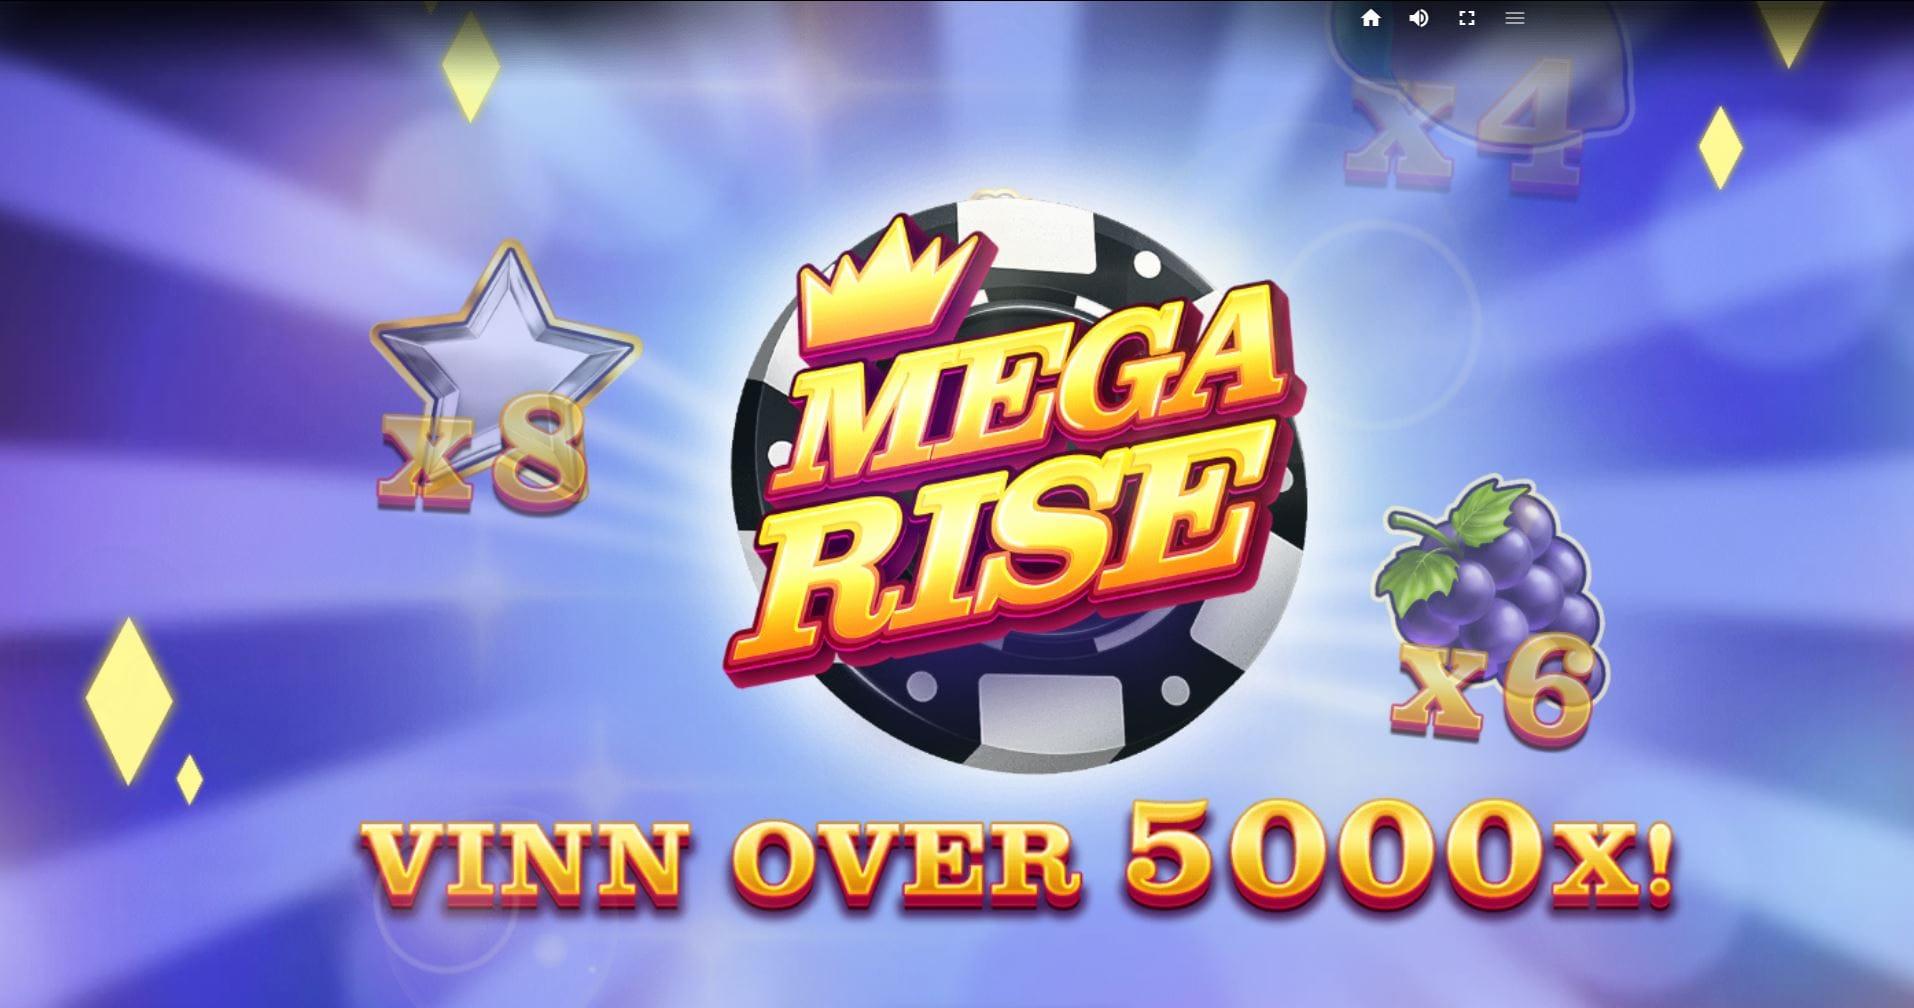 mega rise main barbados bingo